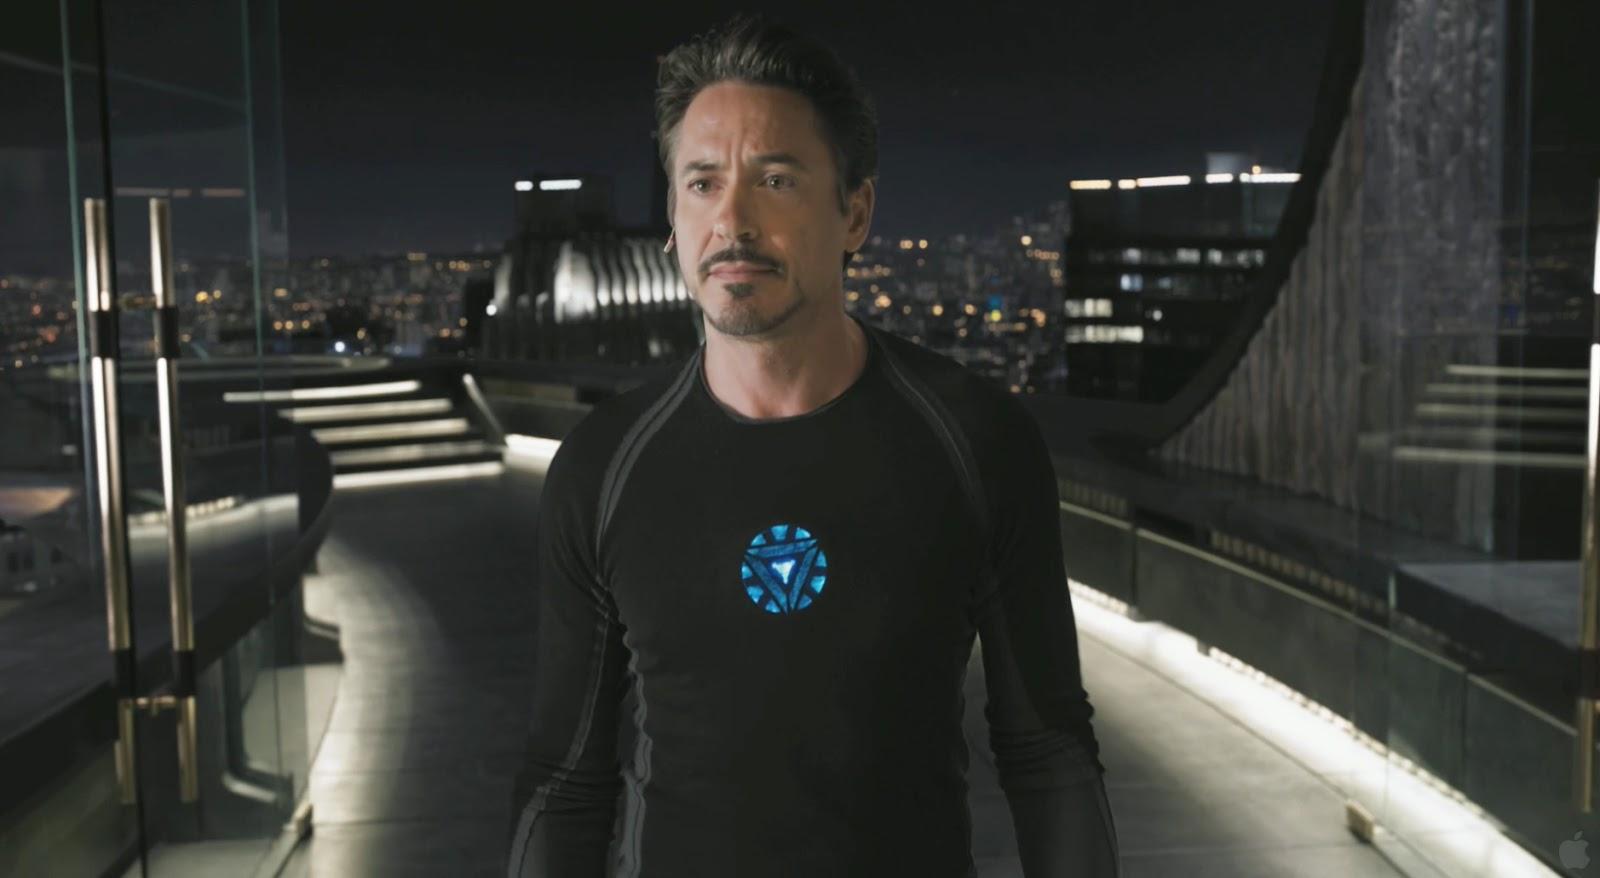 http://3.bp.blogspot.com/-10A6ljhdhQI/T5tXZBeQB9I/AAAAAAAAAyc/ozrQSde9-6U/s1600/Robert-Downey-Jr-The-Avengers-Iron-Man-3.jpg